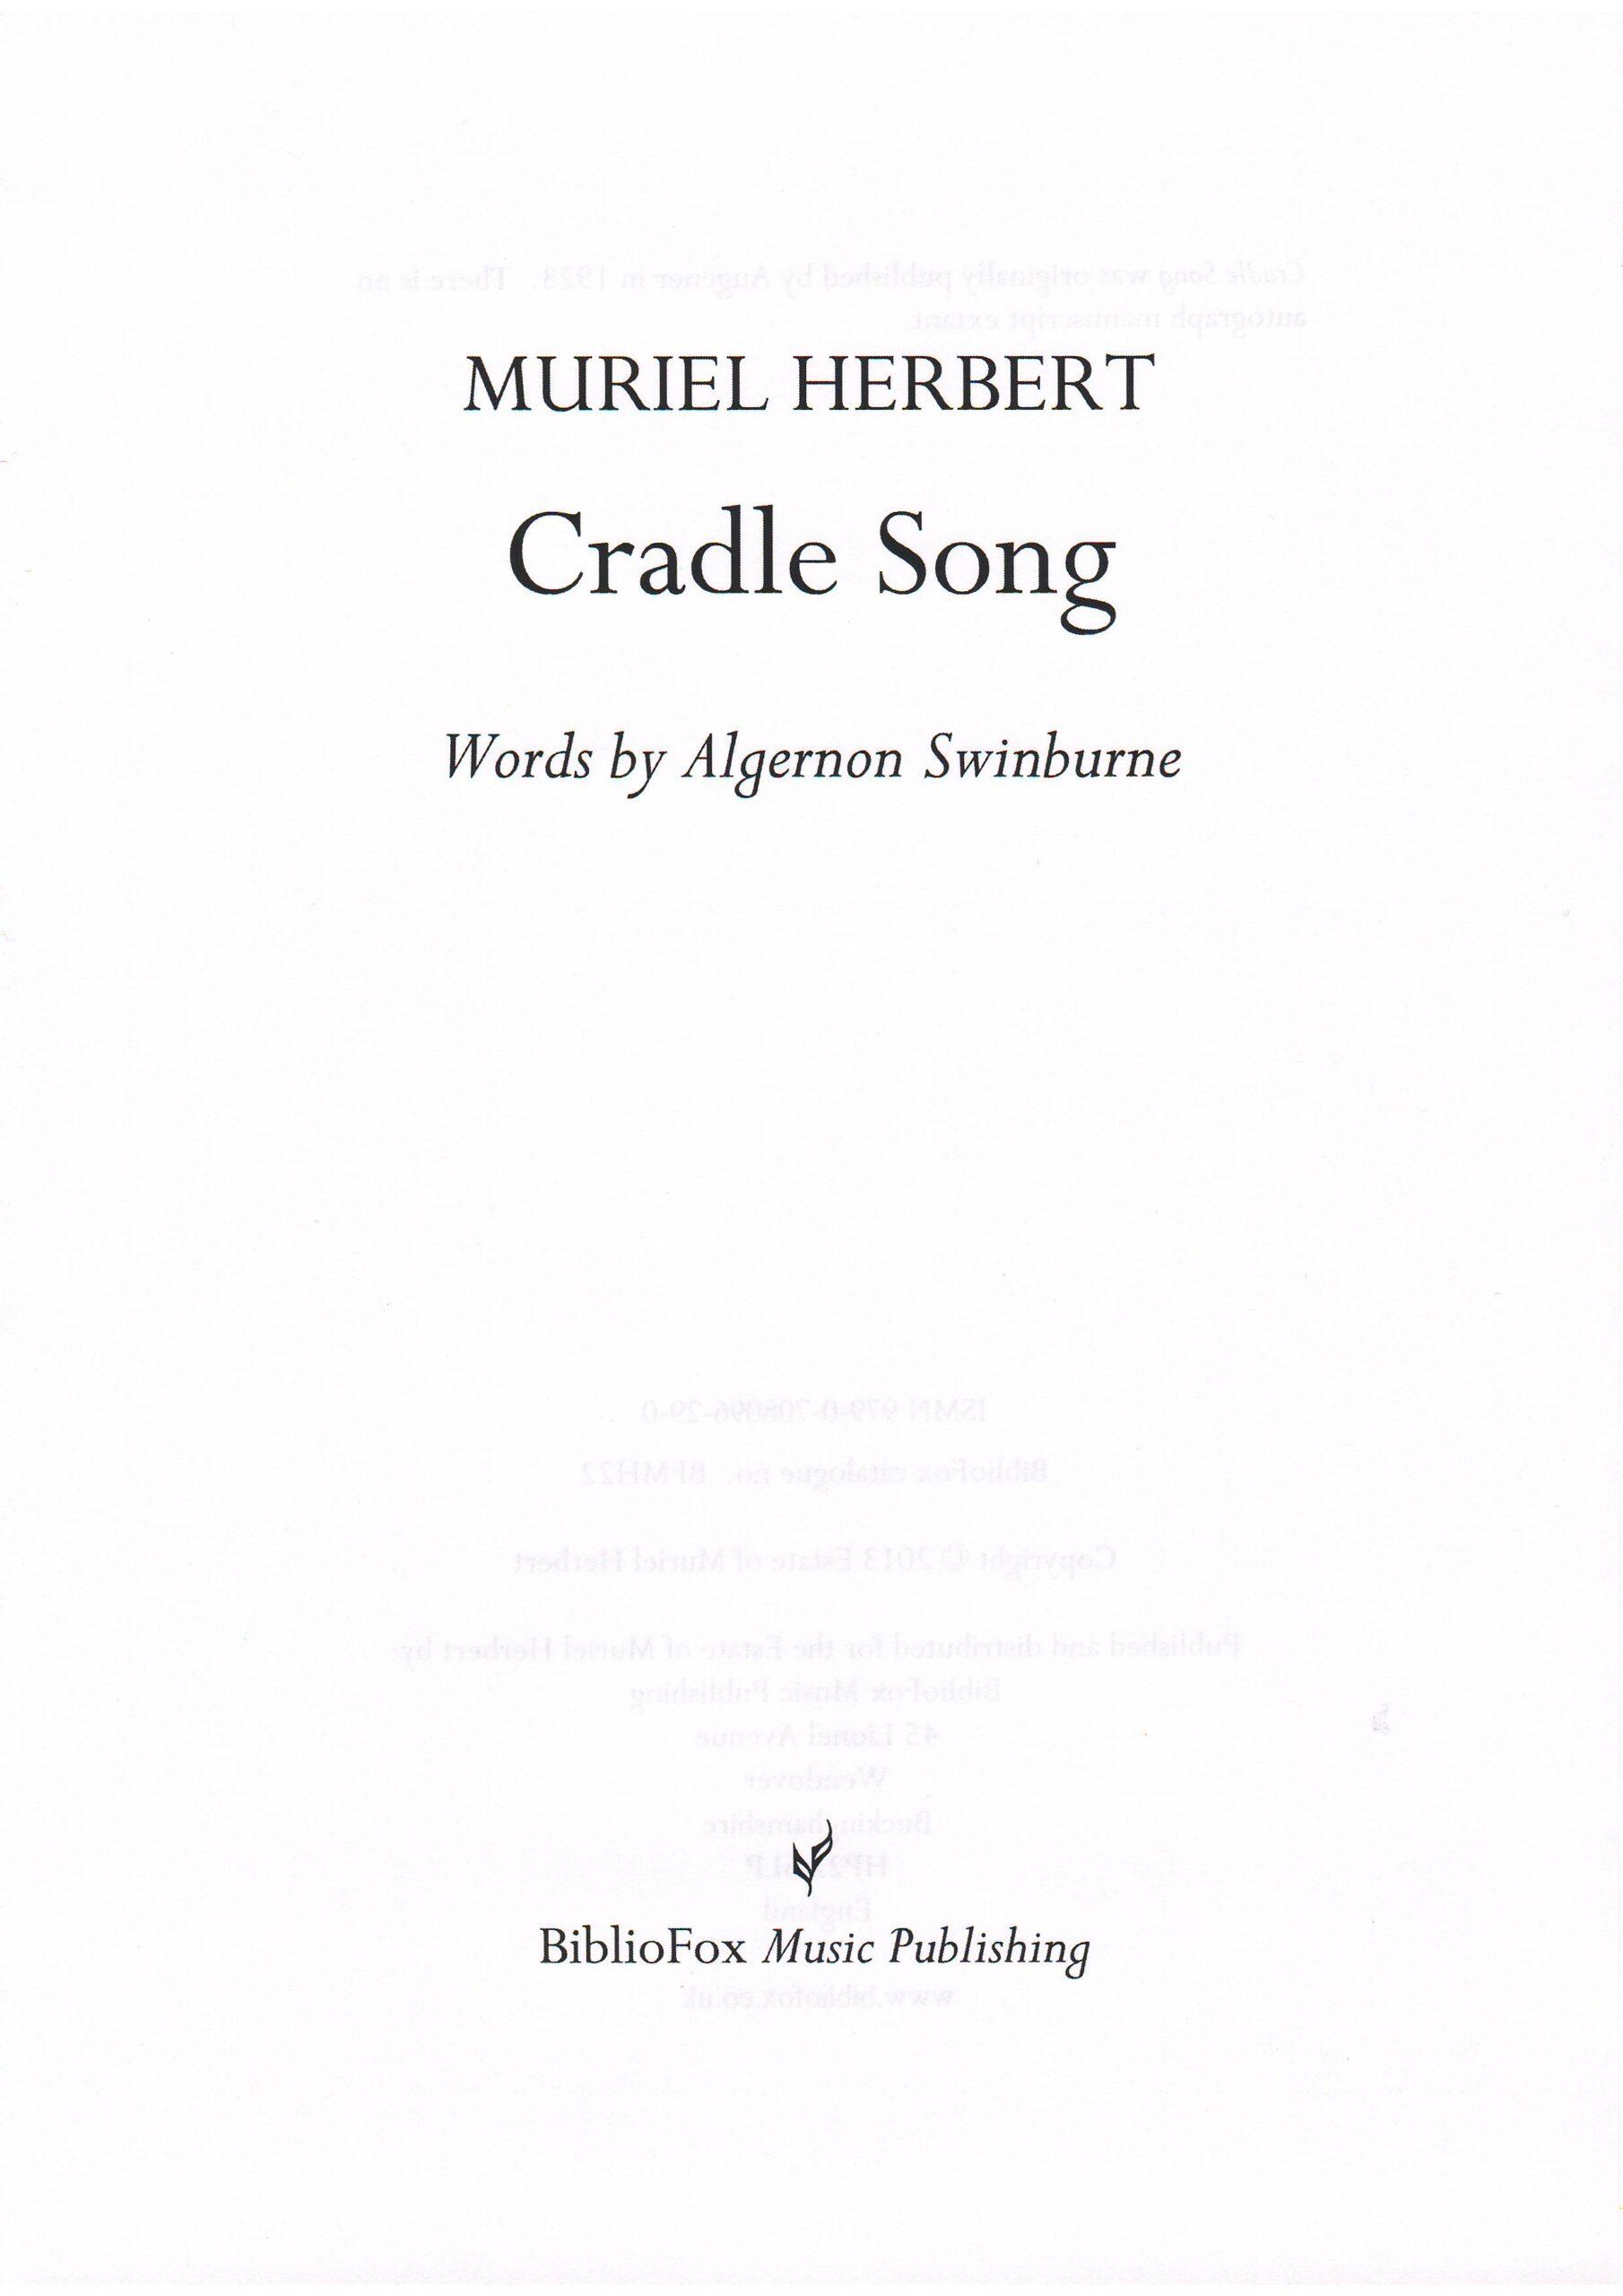 Cover page of Muriel Herbert Cradle Song